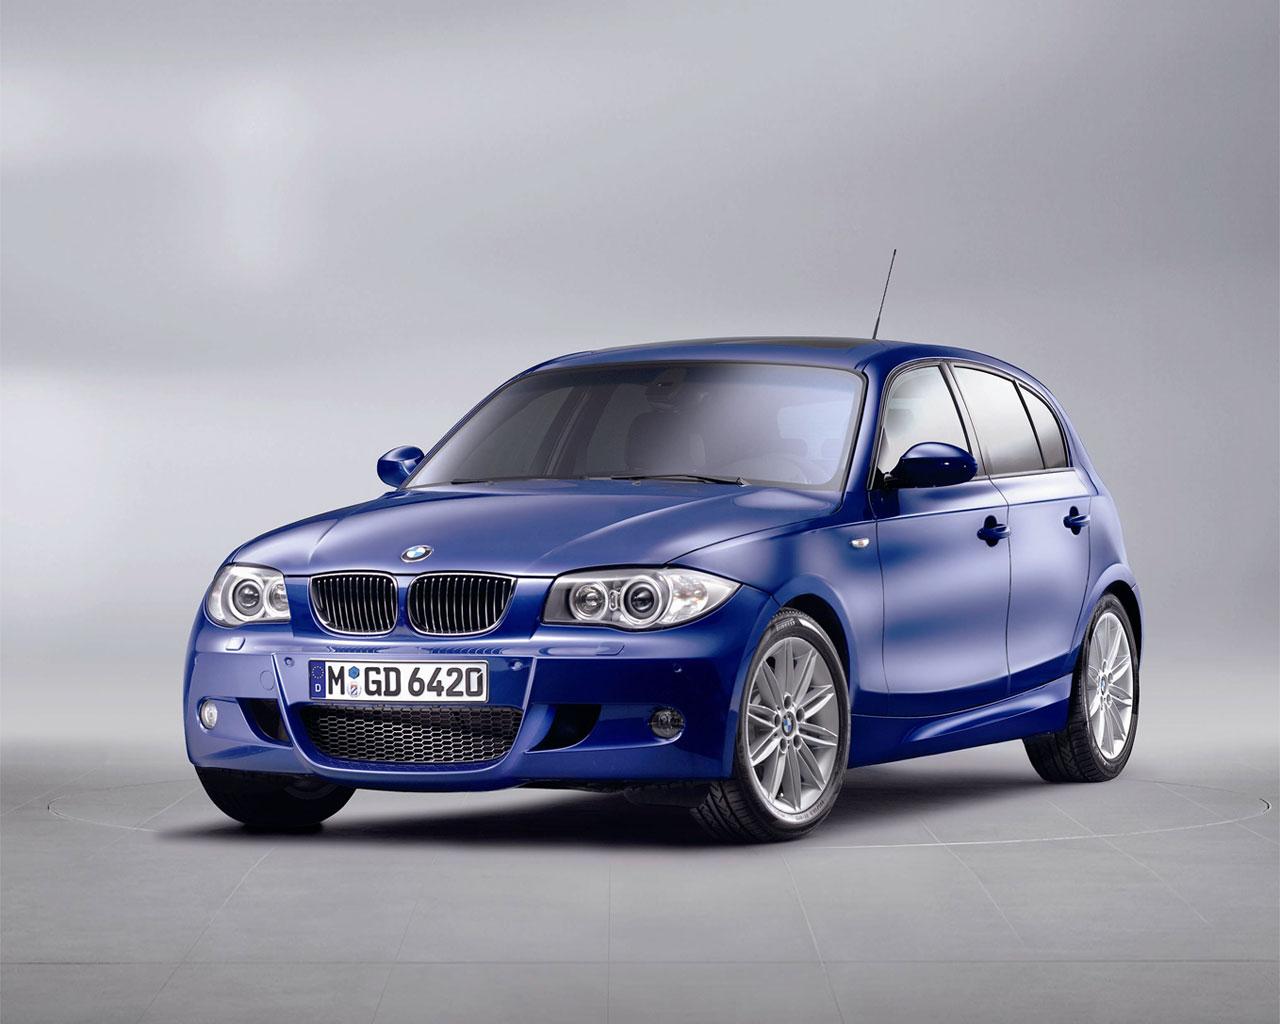 BMW 130i m Sport Wallpaper Backgrounds